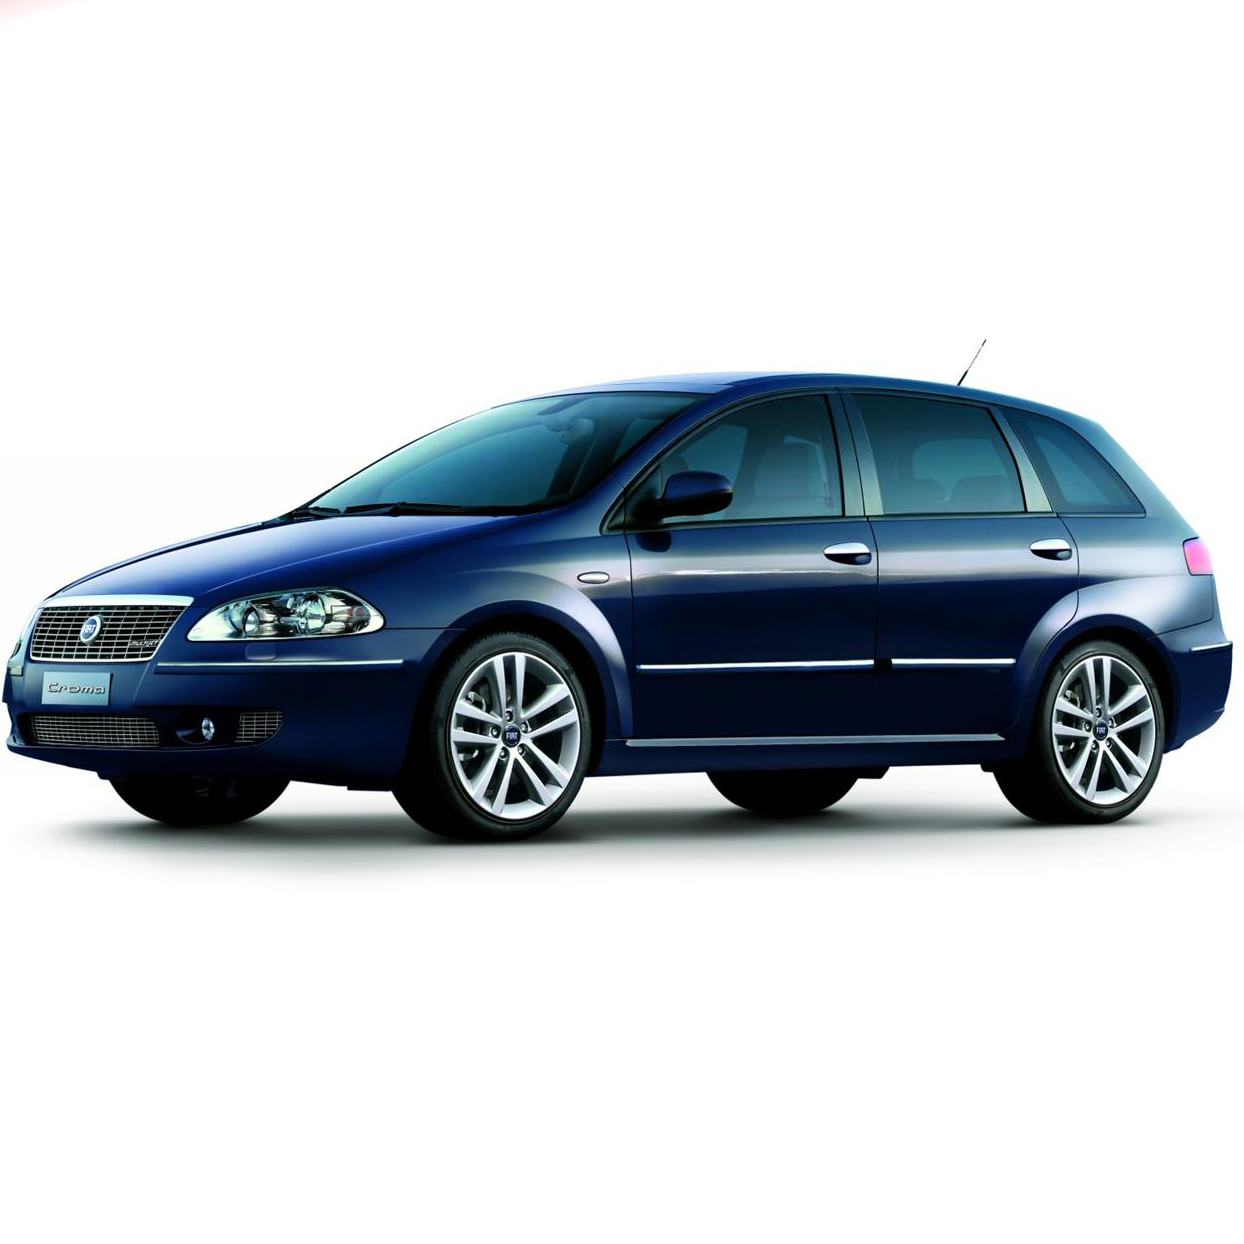 Fiat Croma 2005 - 2010